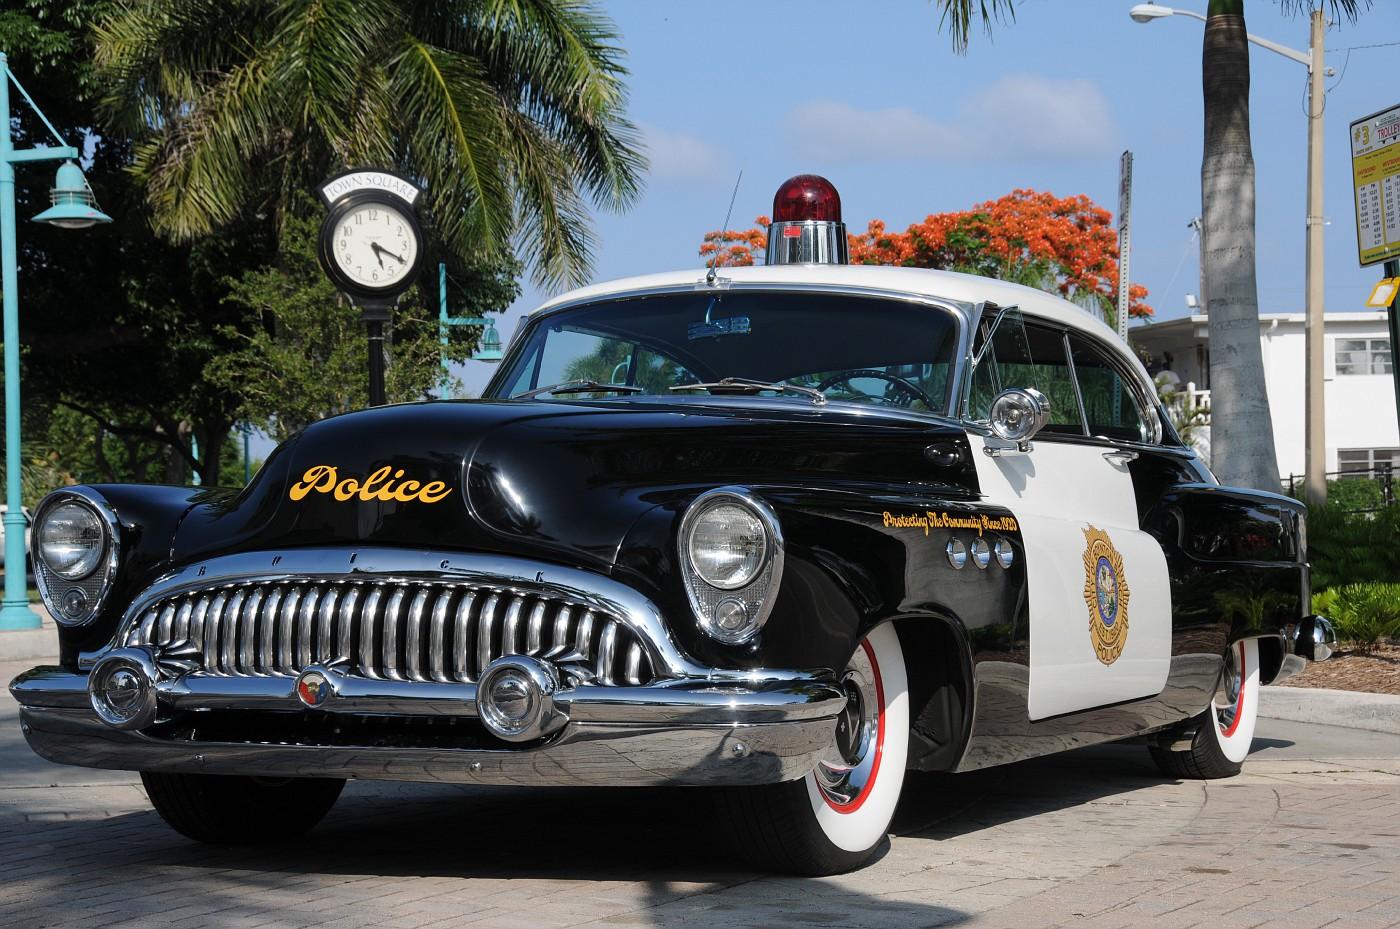 FL - Boynton Beach Police